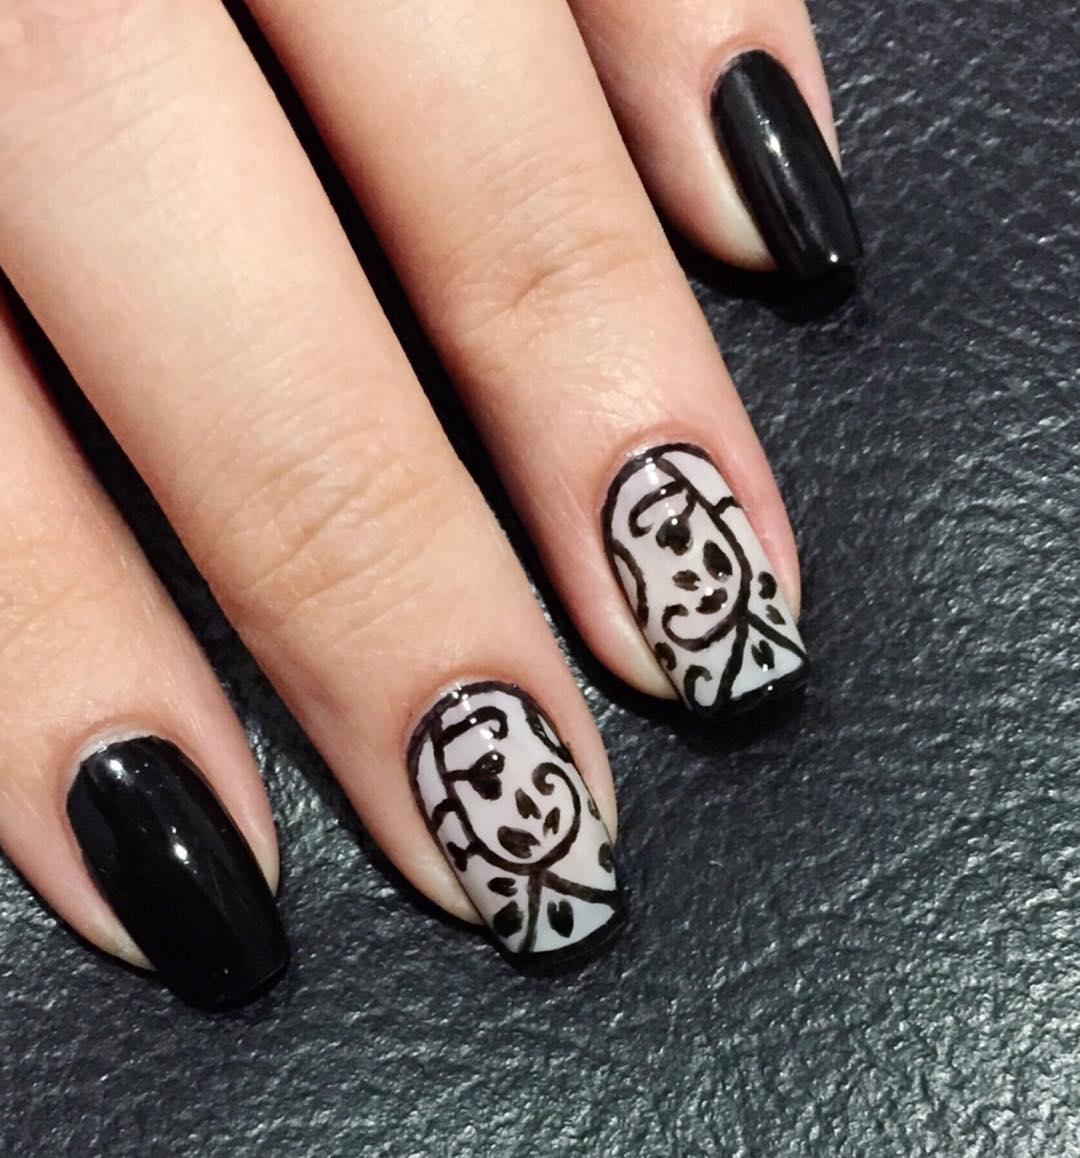 Black Acrylic Nail Art Designs Ideas Design Trends Premium View Images